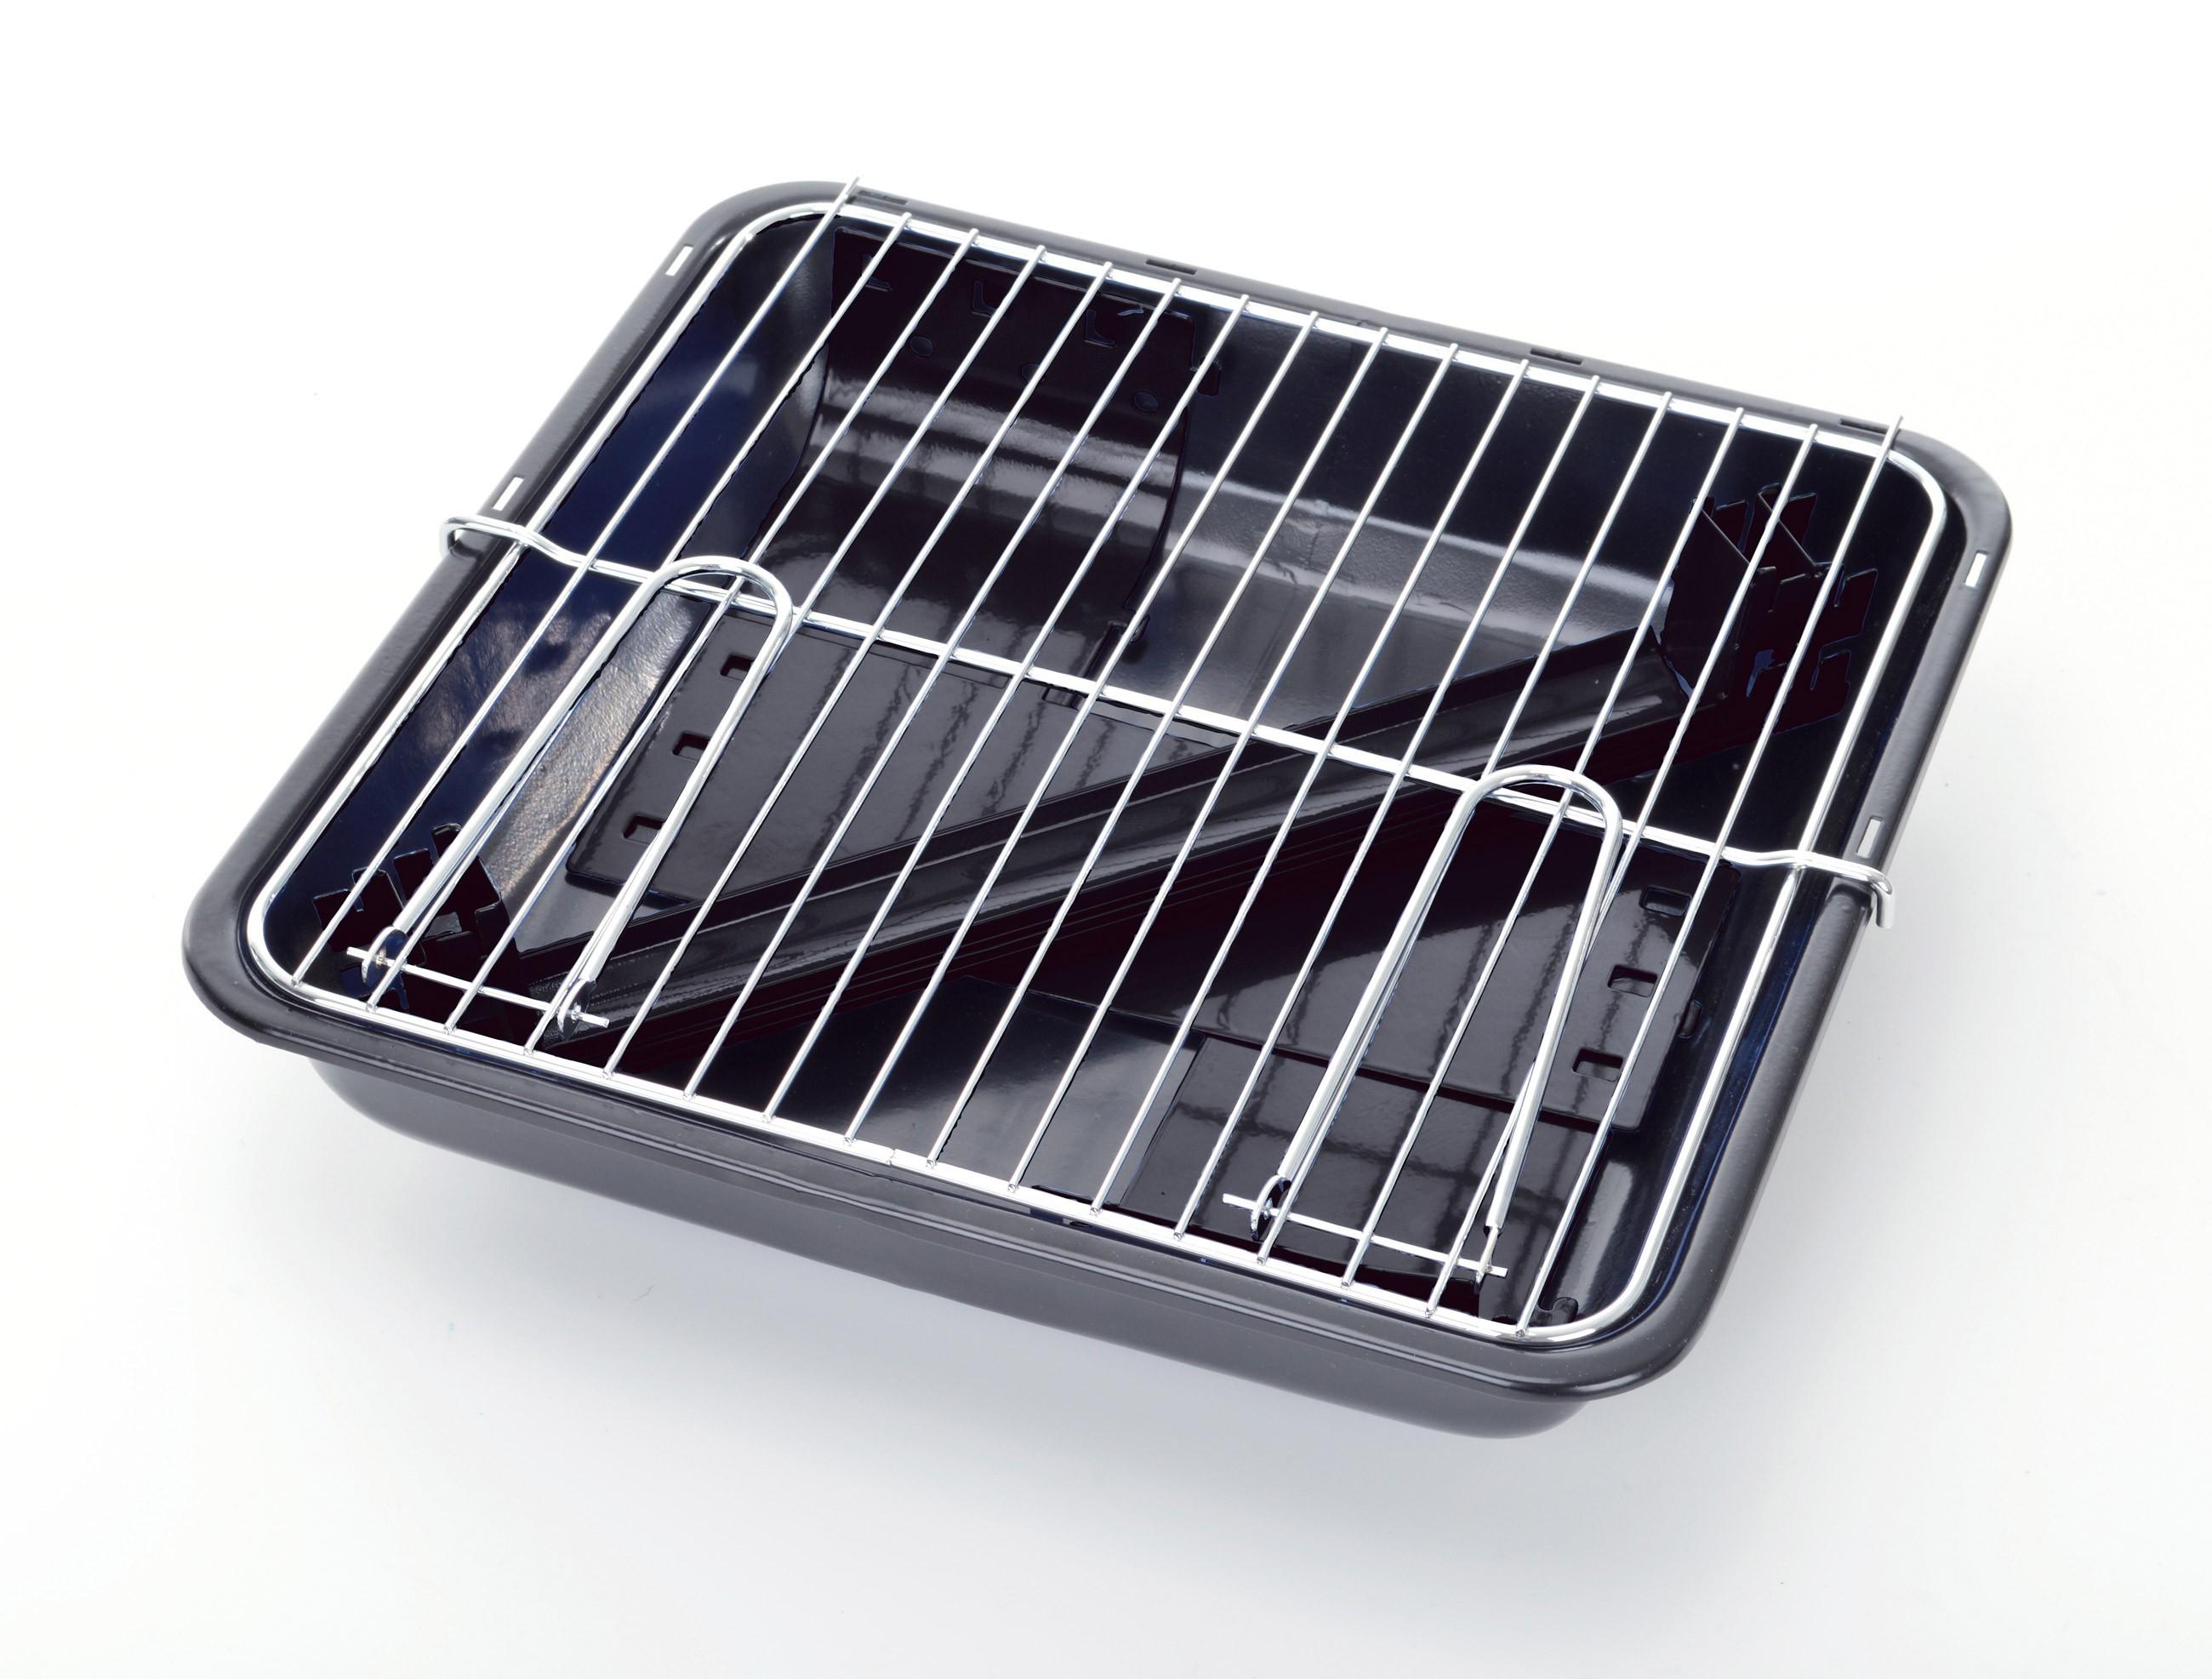 Landmann 11527 Portago Holzkohlegrill : Grill chef holzkohlegrill portago schwarz cm bei